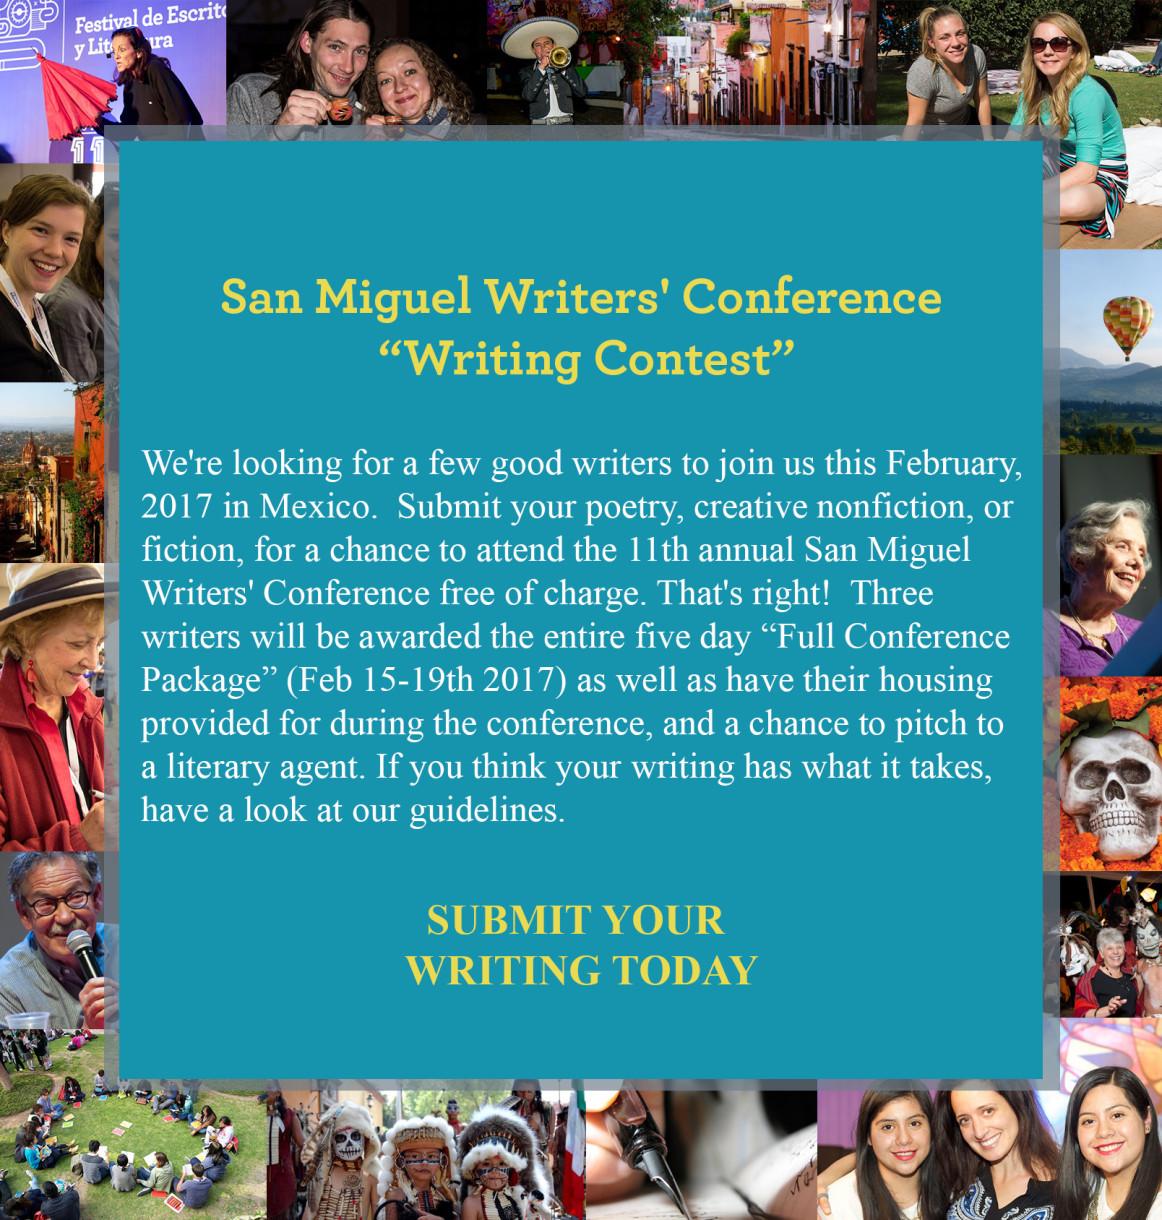 SMWC Writing Contest promo